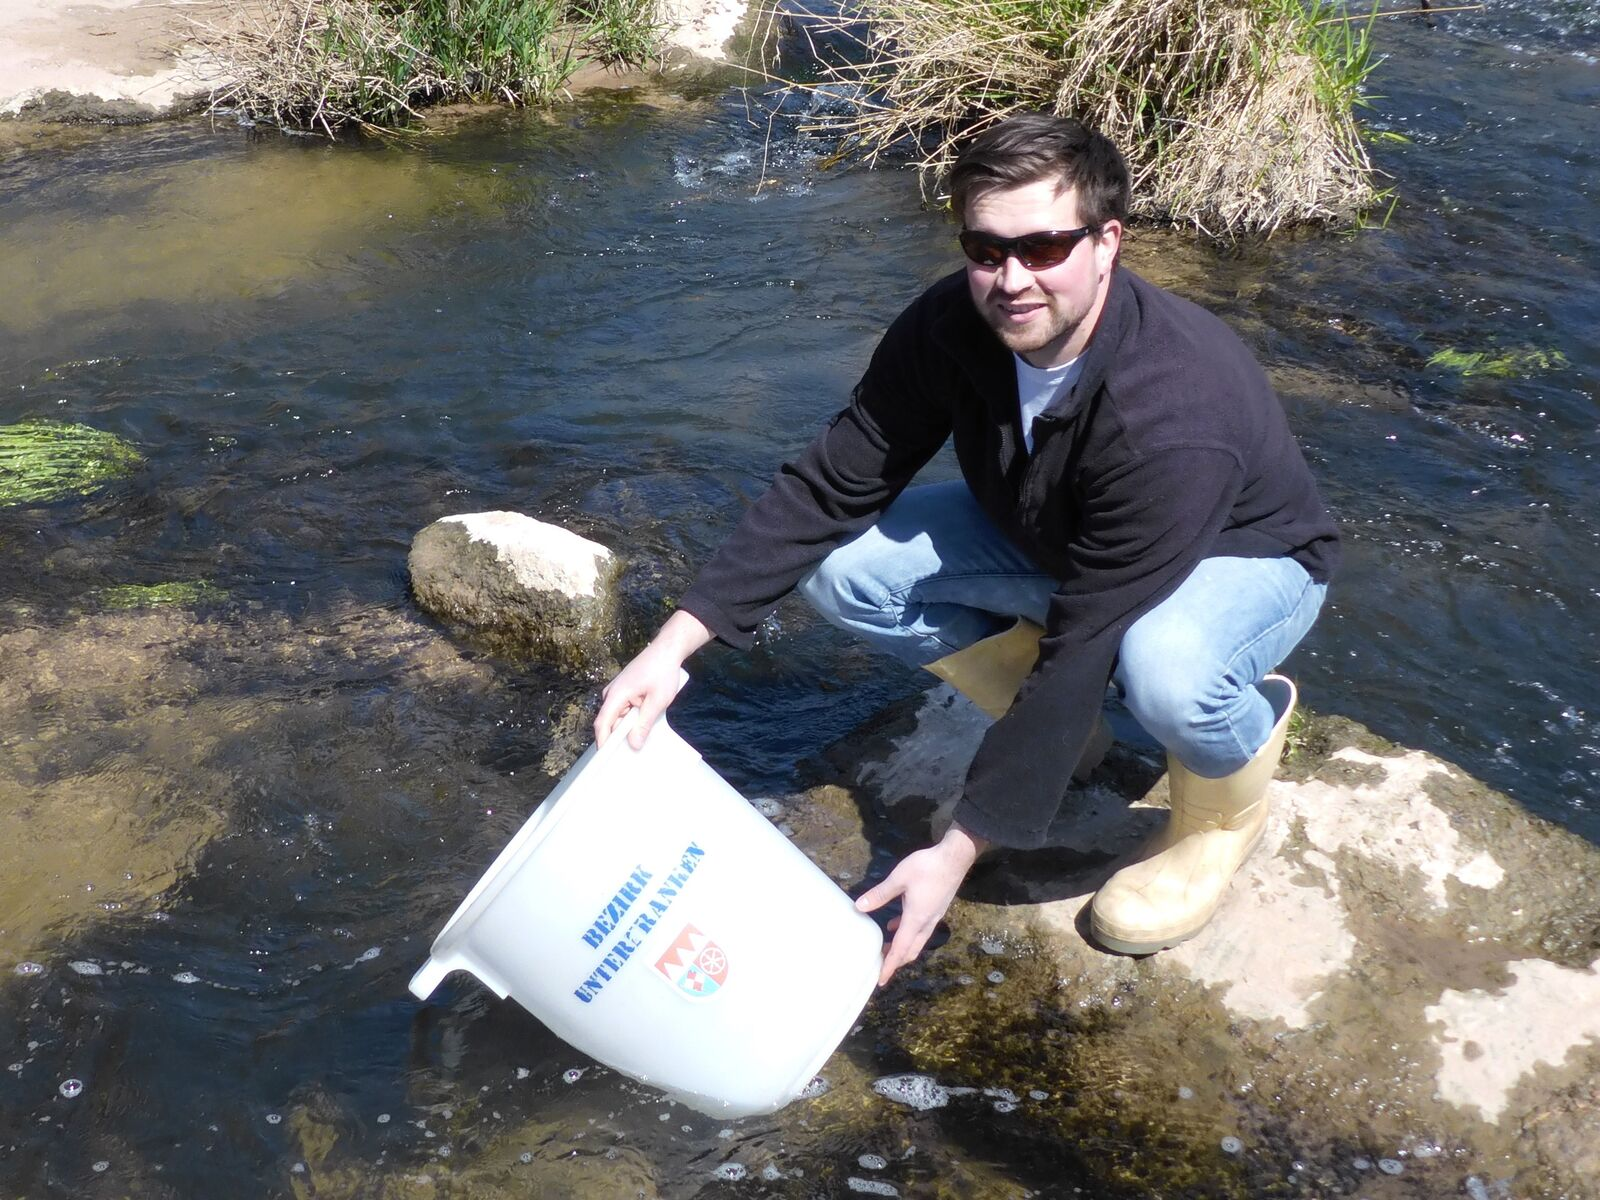 Mann lässt Fische ins Gewässer